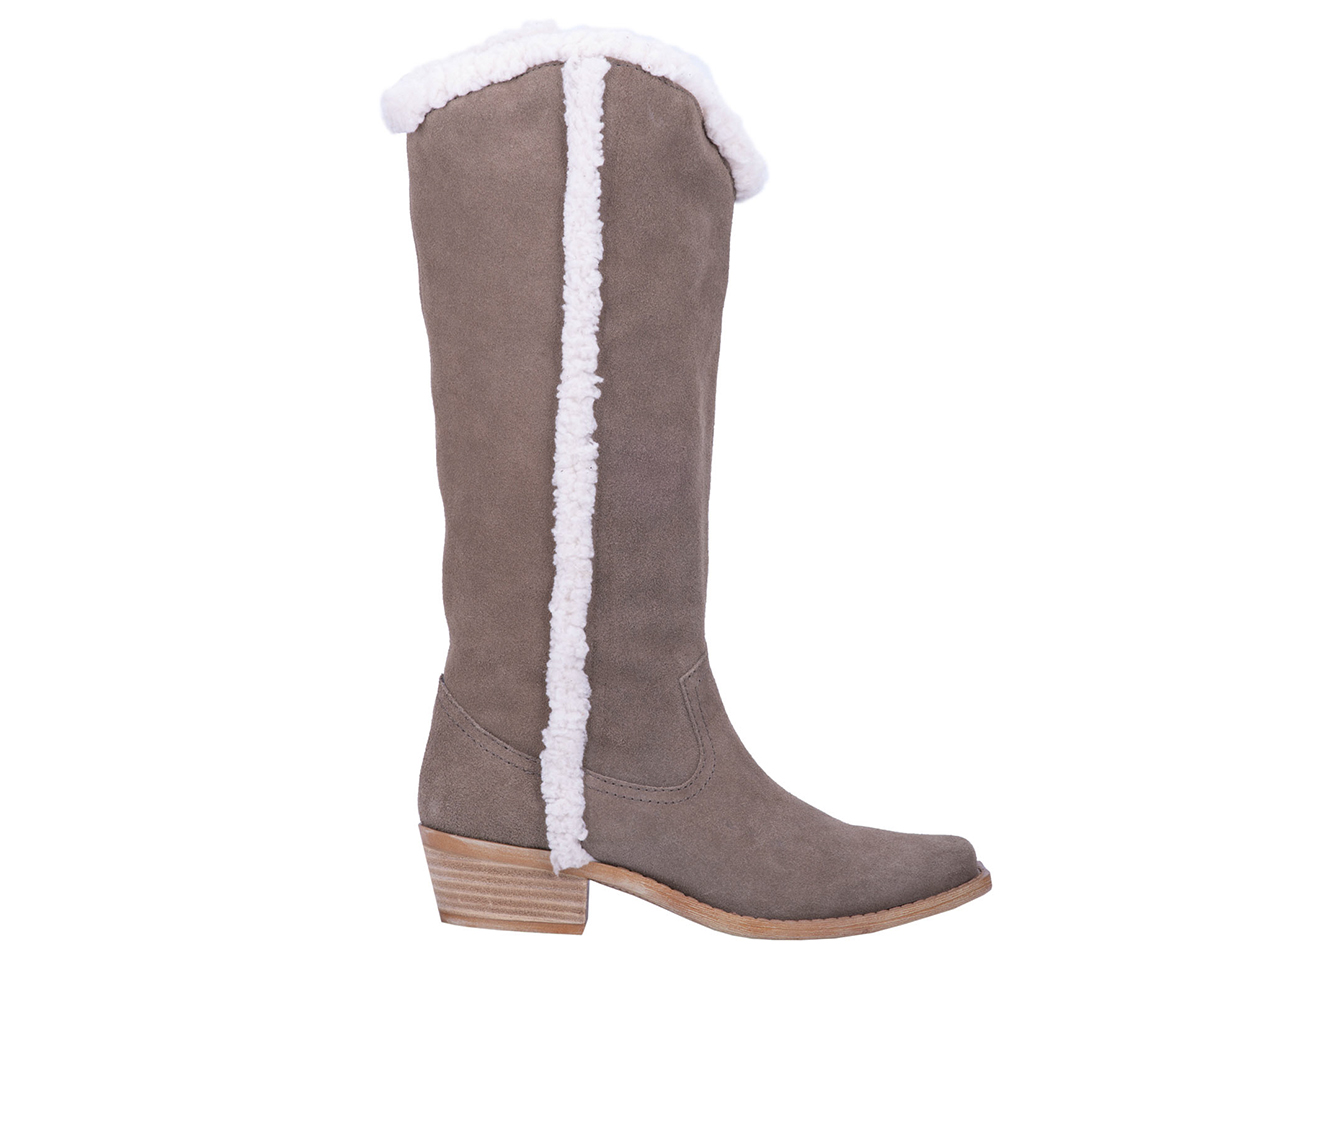 Dingo Boots Jango Women's Boots (Brown - Leather)